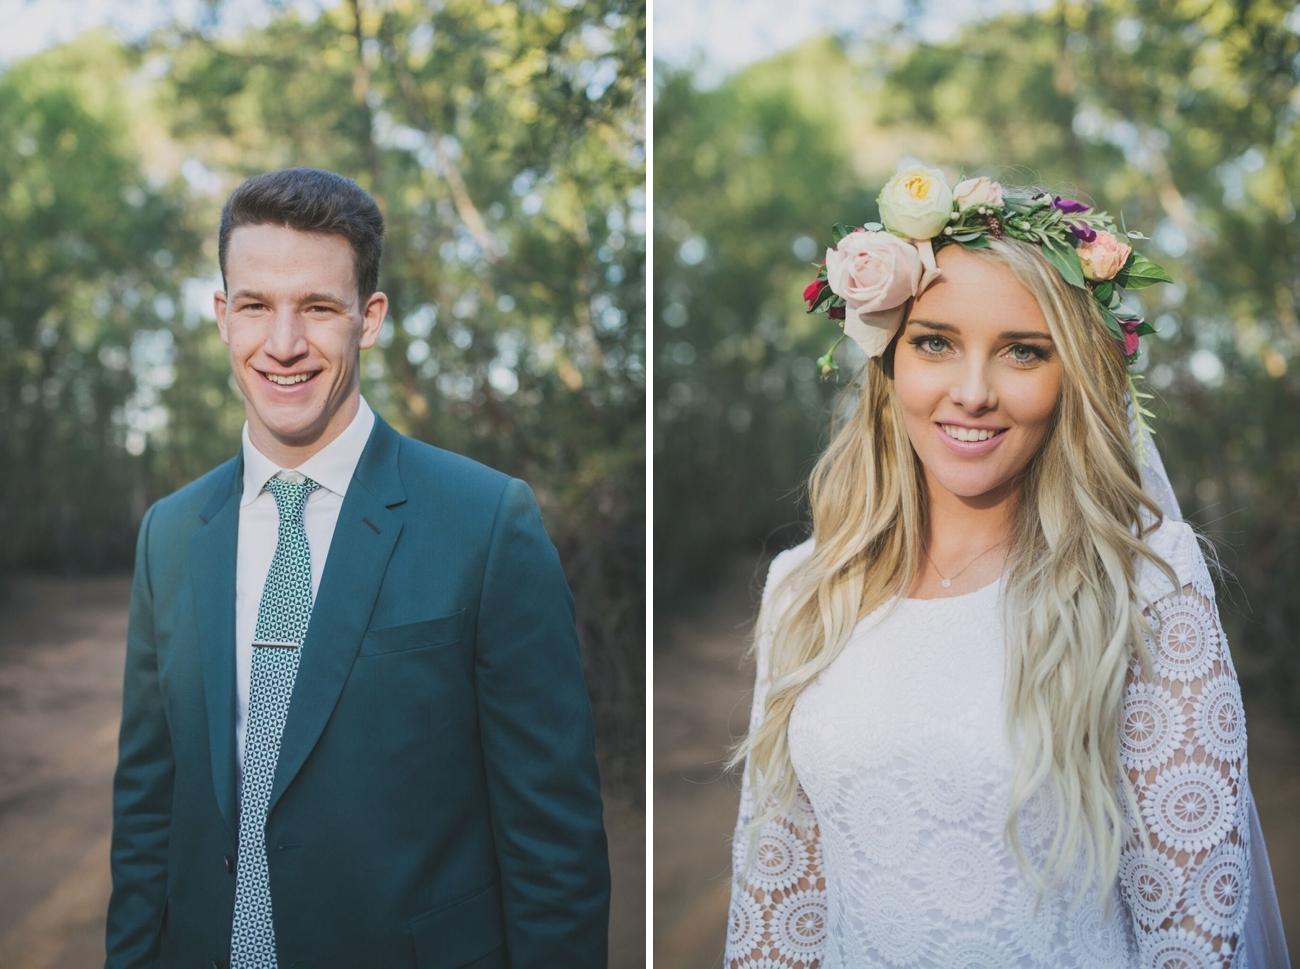 Flower Crown Bride | Credit: Vicky Bergallo